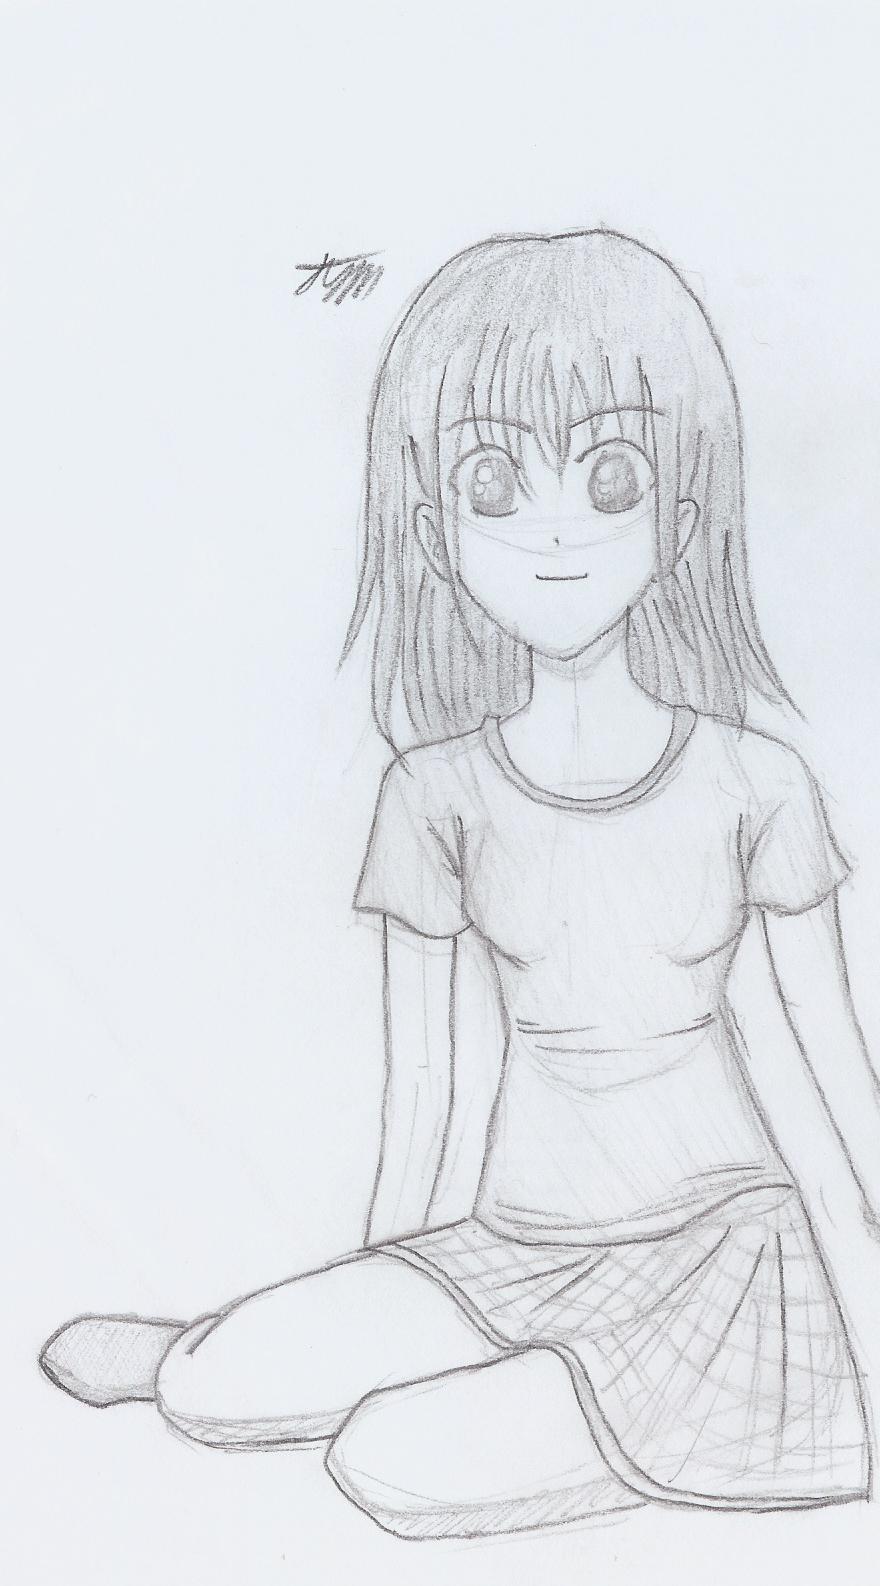 Manga Girl Sitting Down By Cloudrider99 On Deviantart